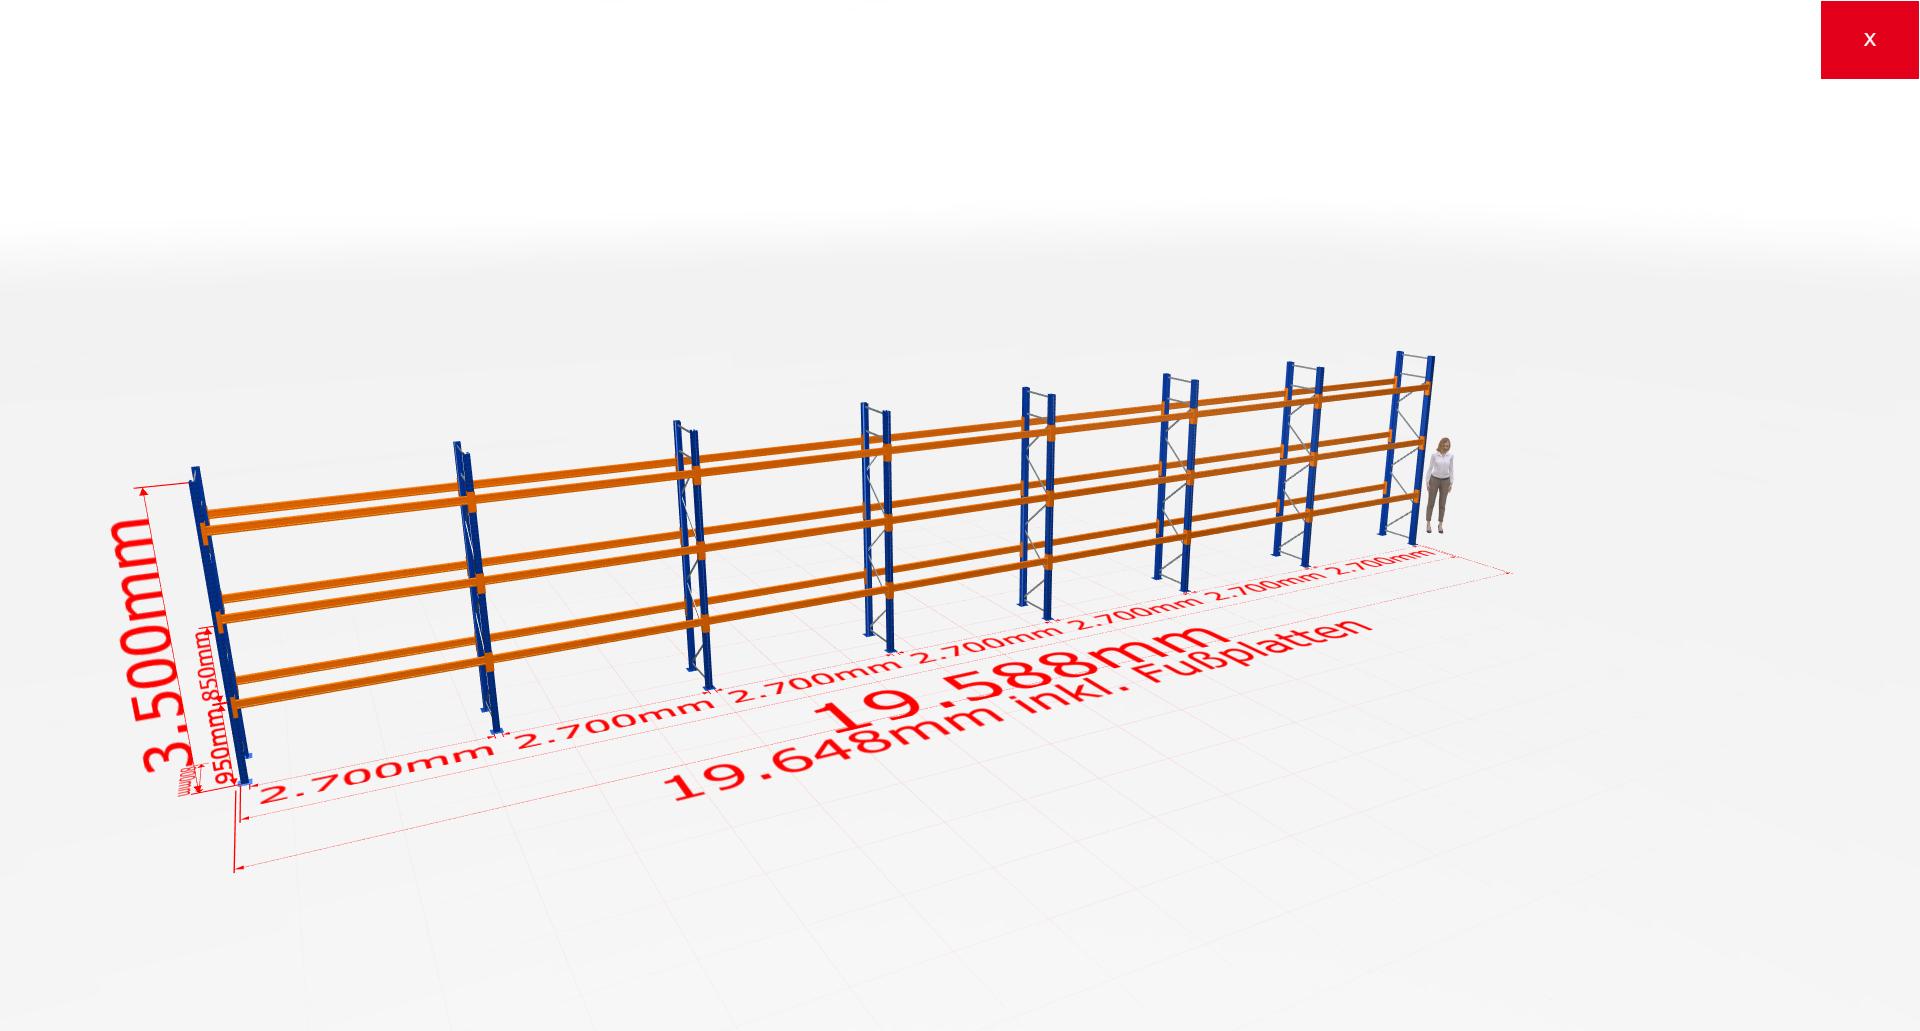 Palettenregal Komplettregal 3500x19588x800 mm (HxBxT) 3 Fachebenen SCHULTE Lagertechnik